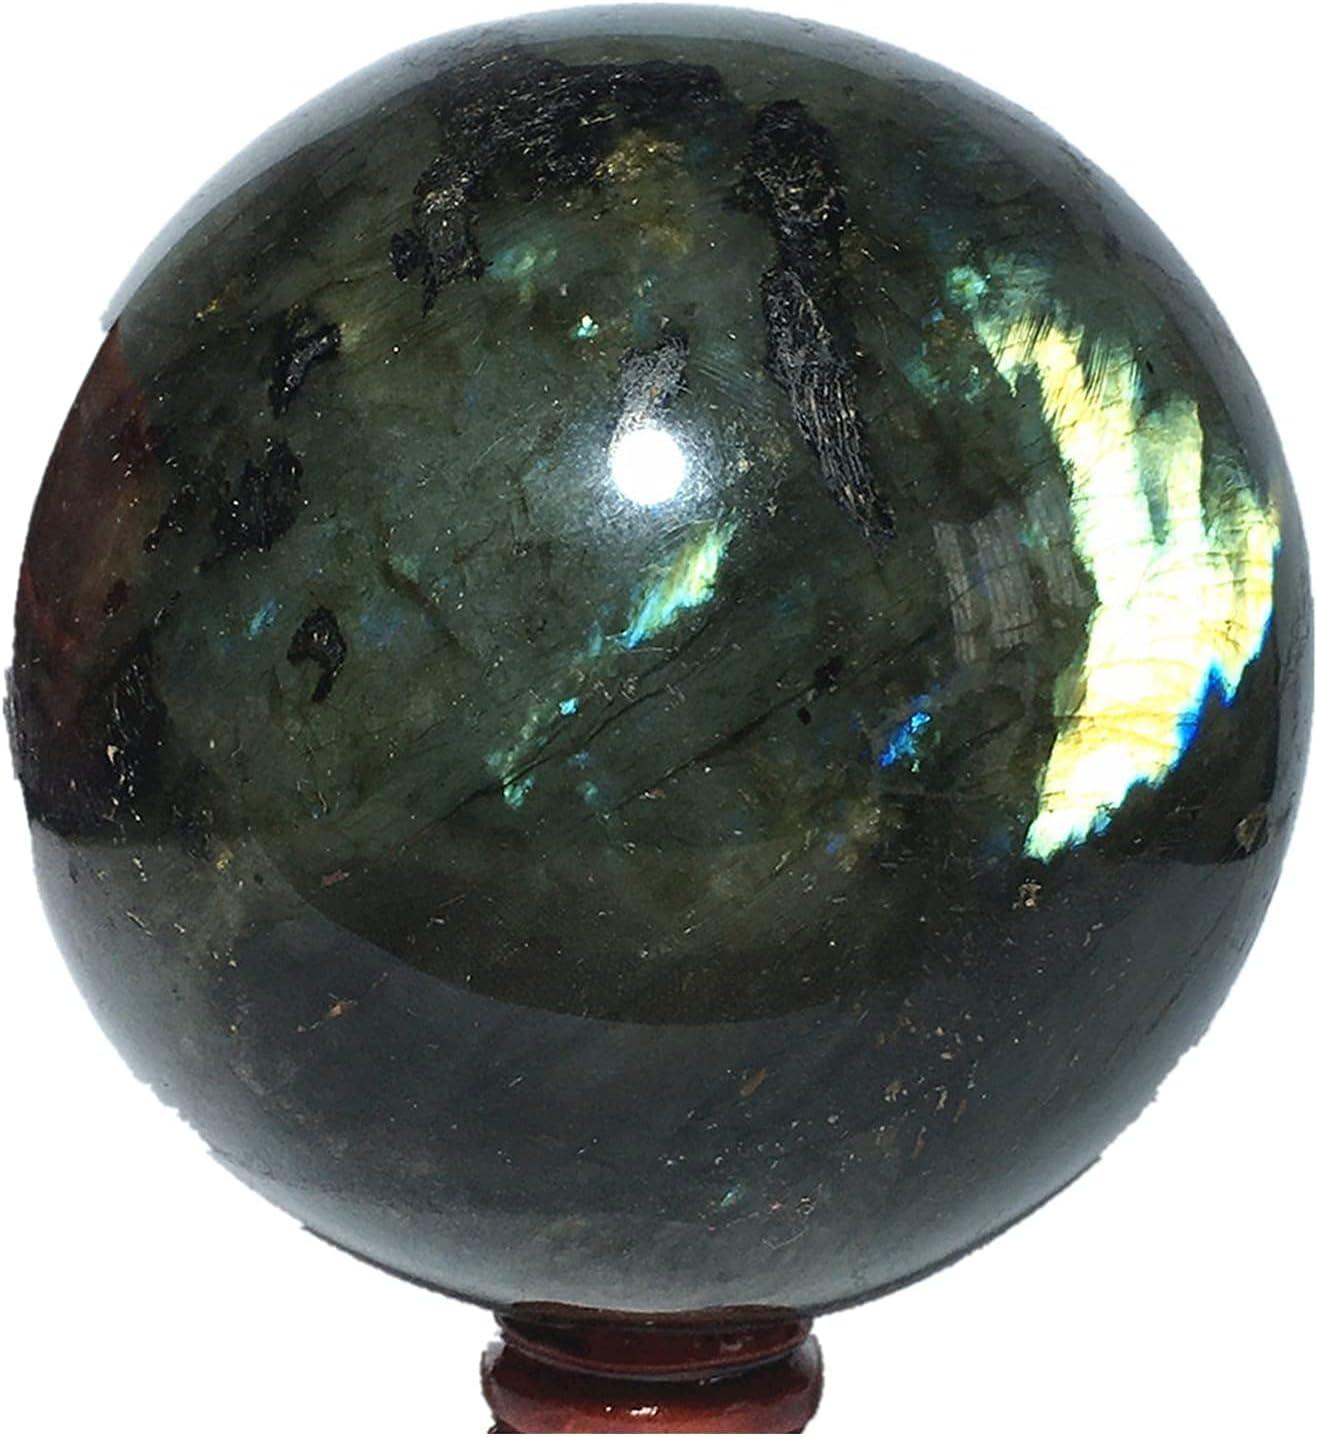 Hencik trend rank Stones Natural Sphere Labradorite Crystal Home Sale Quartz Fur